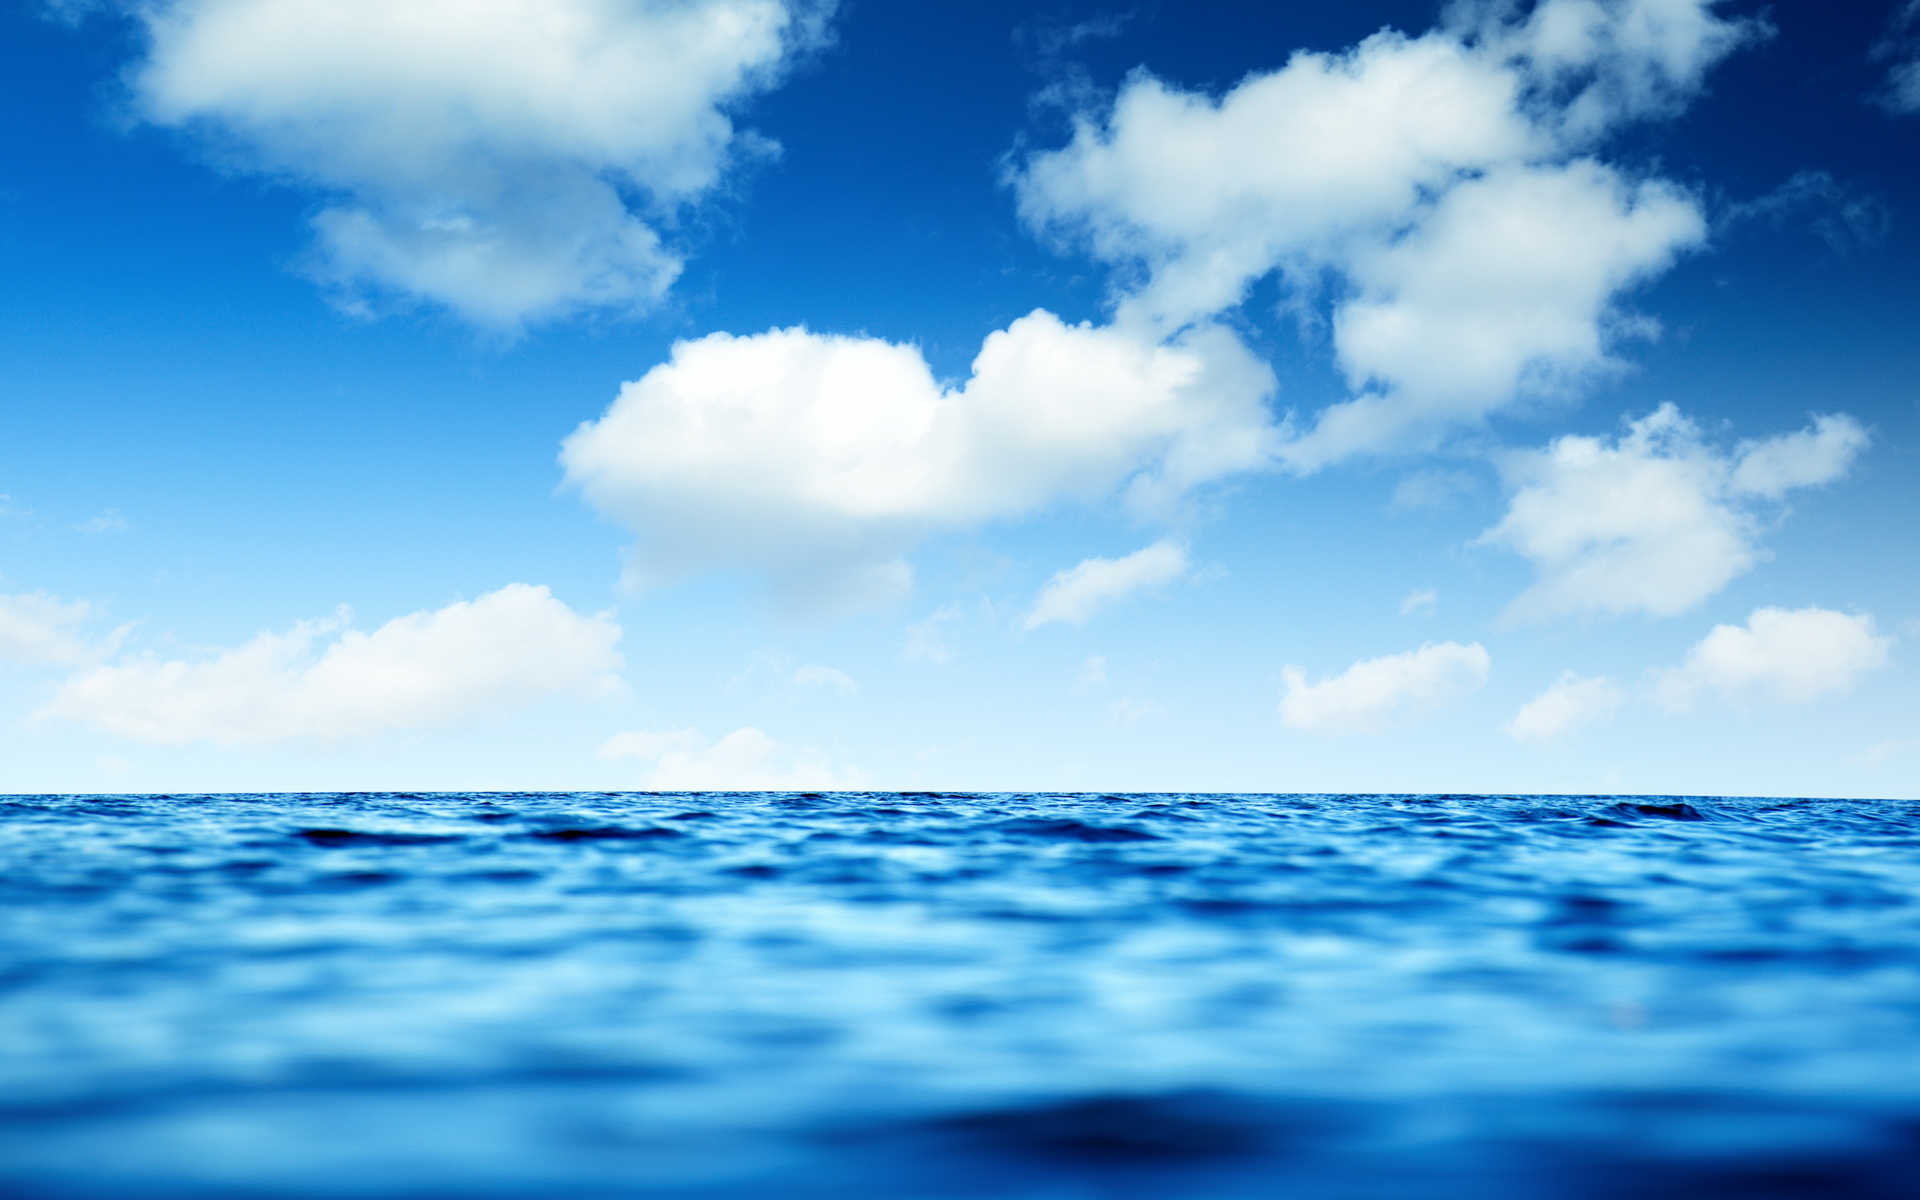 природа песок море горизонт небо облака  № 2577556 без смс